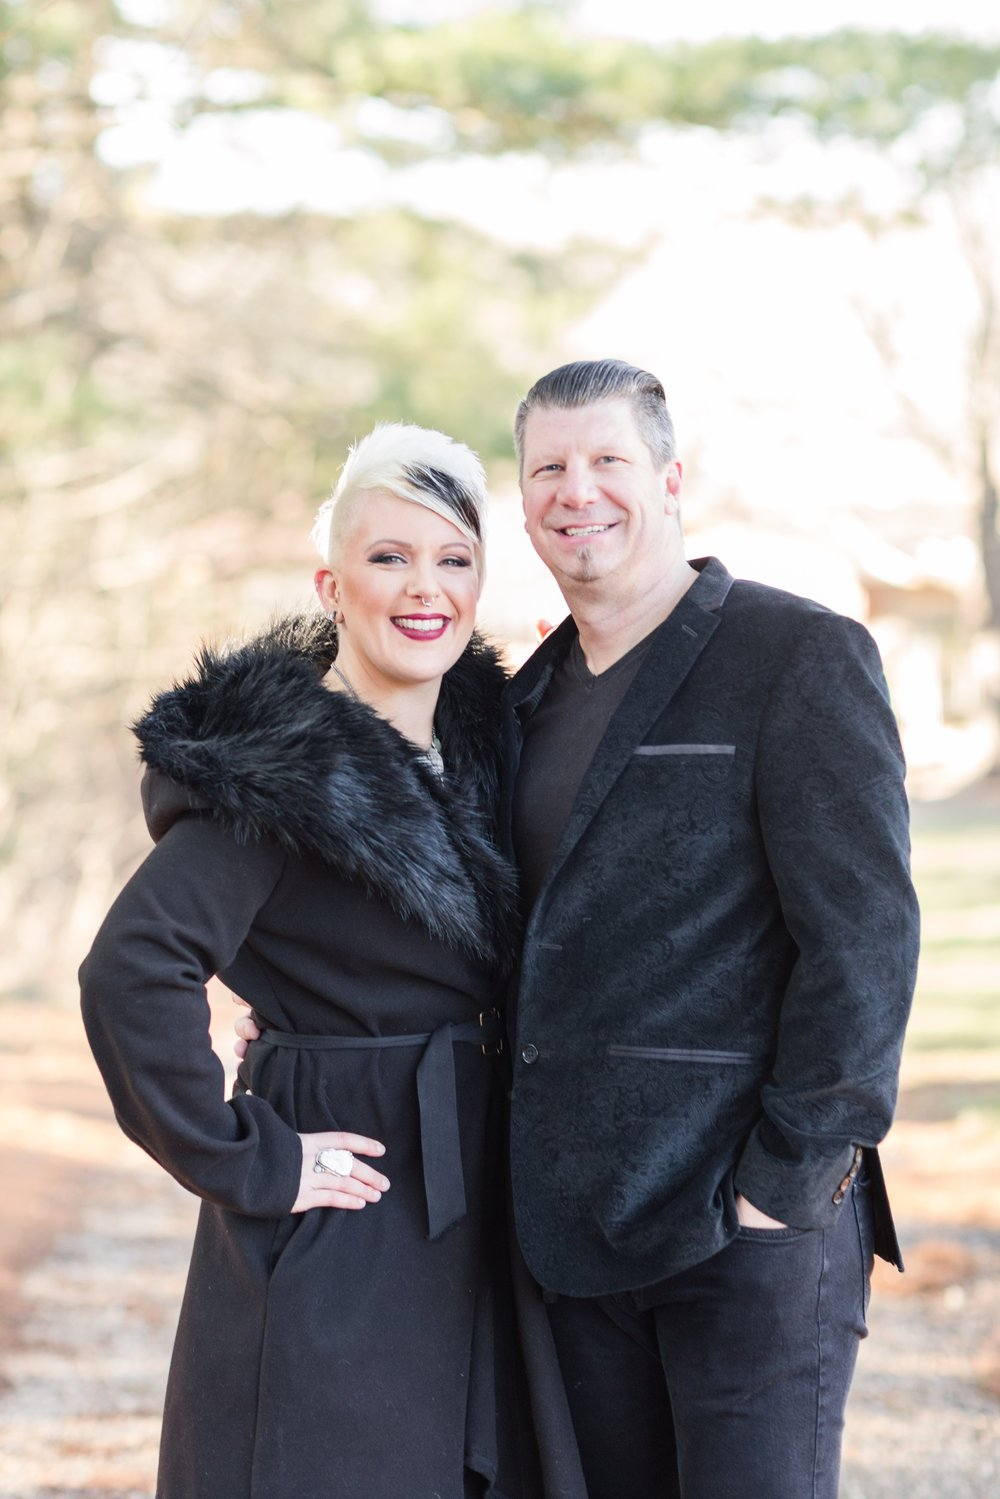 Jess and Cory Anniversary Shoot 2018-29_maryland-anniversary-engagement-photographer-anna-grace-photography-photo.jpg